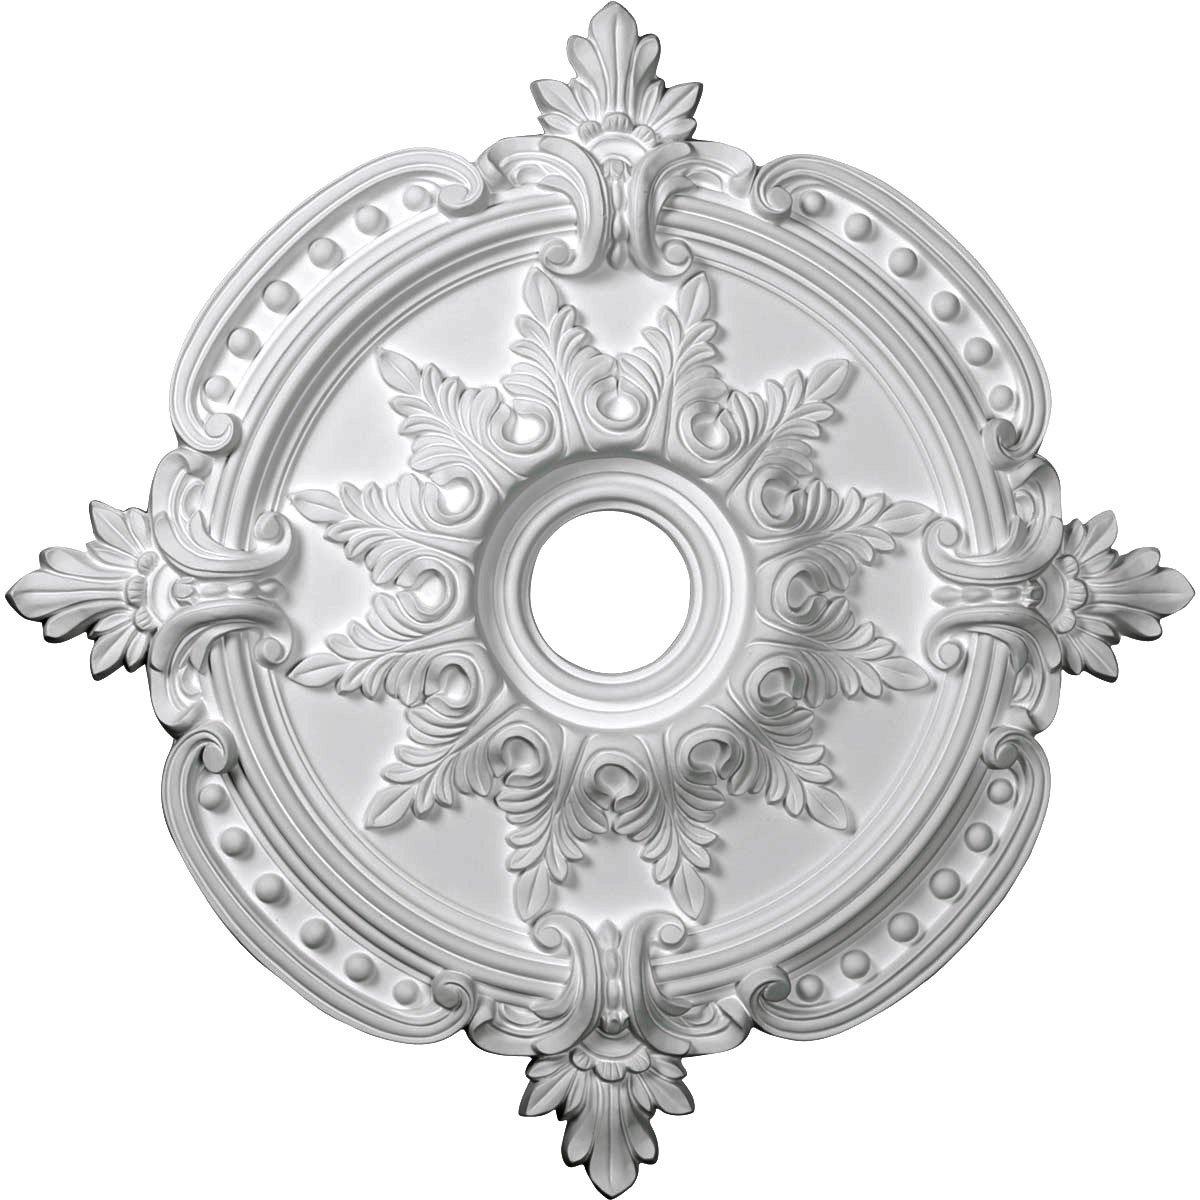 Ekena Millwork CM28BE 28 3/8-Inch OD x 4 1/2-Inch ID x 1 5/8-Inch P Benson Classic Ceiling Medallion by Ekena Millwork